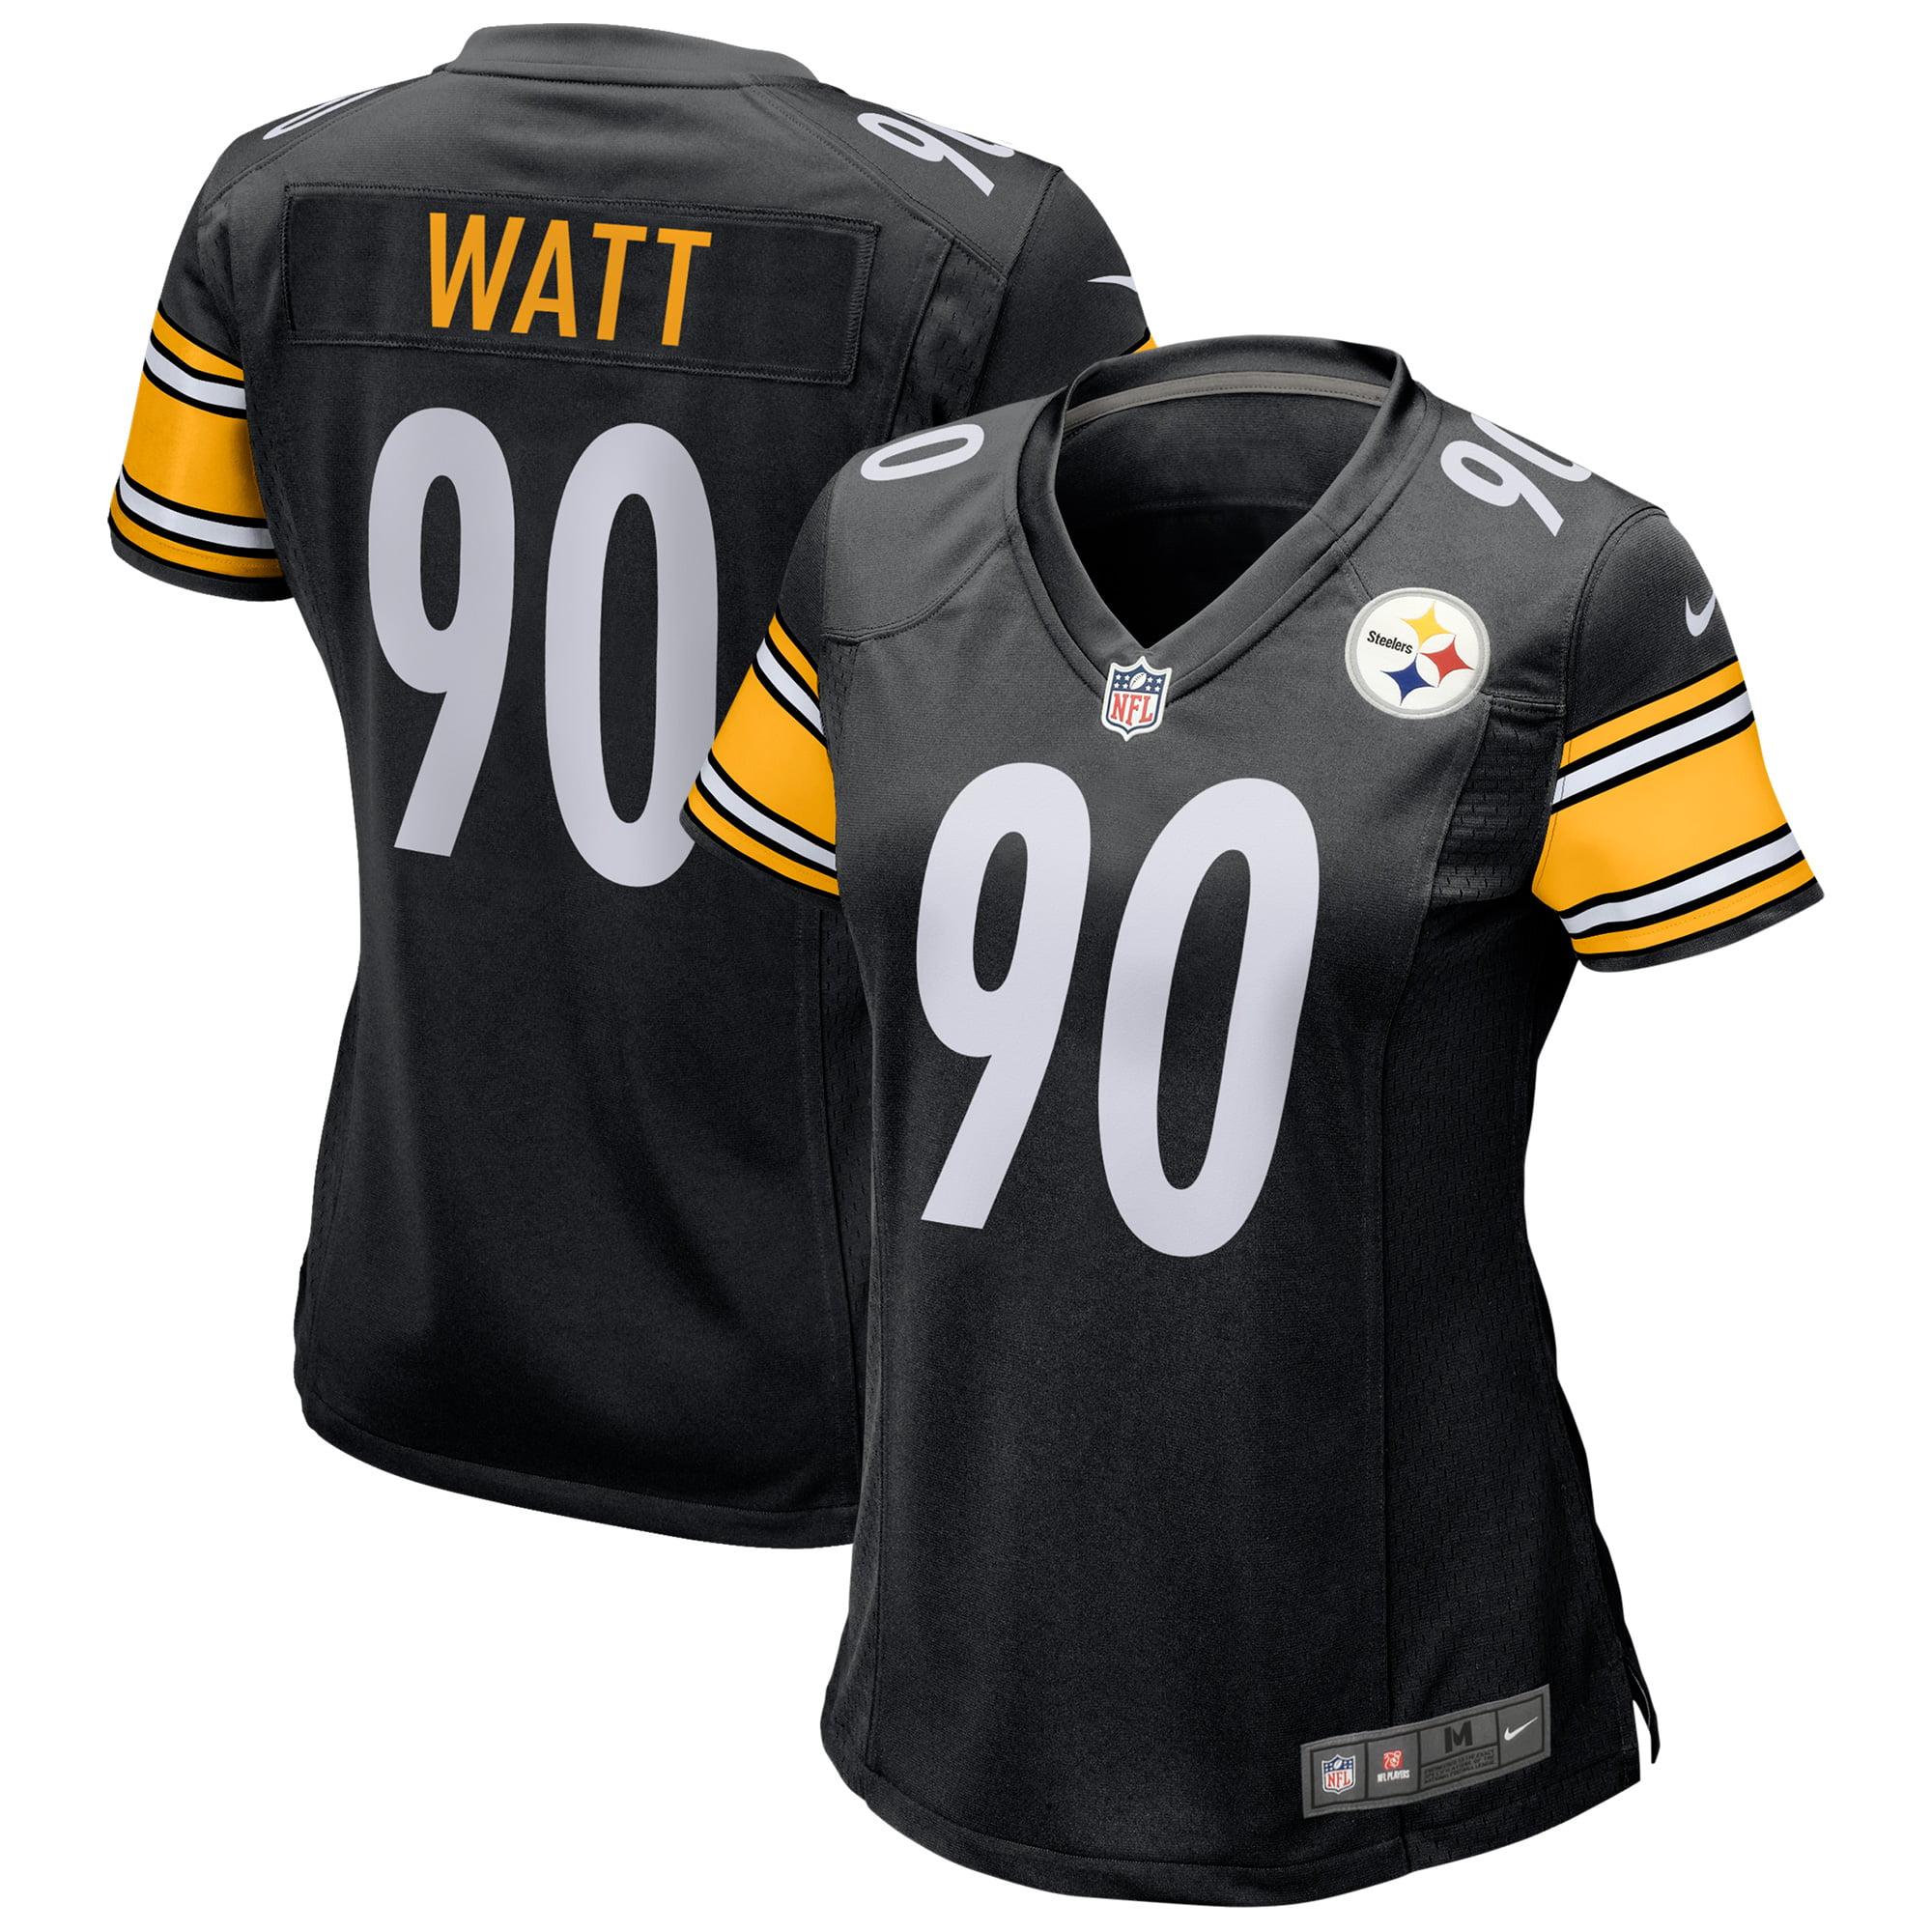 detailed look 62a1c 46c6f T.J. Watt Pittsburgh Steelers Nike Women's Game Jersey - Black